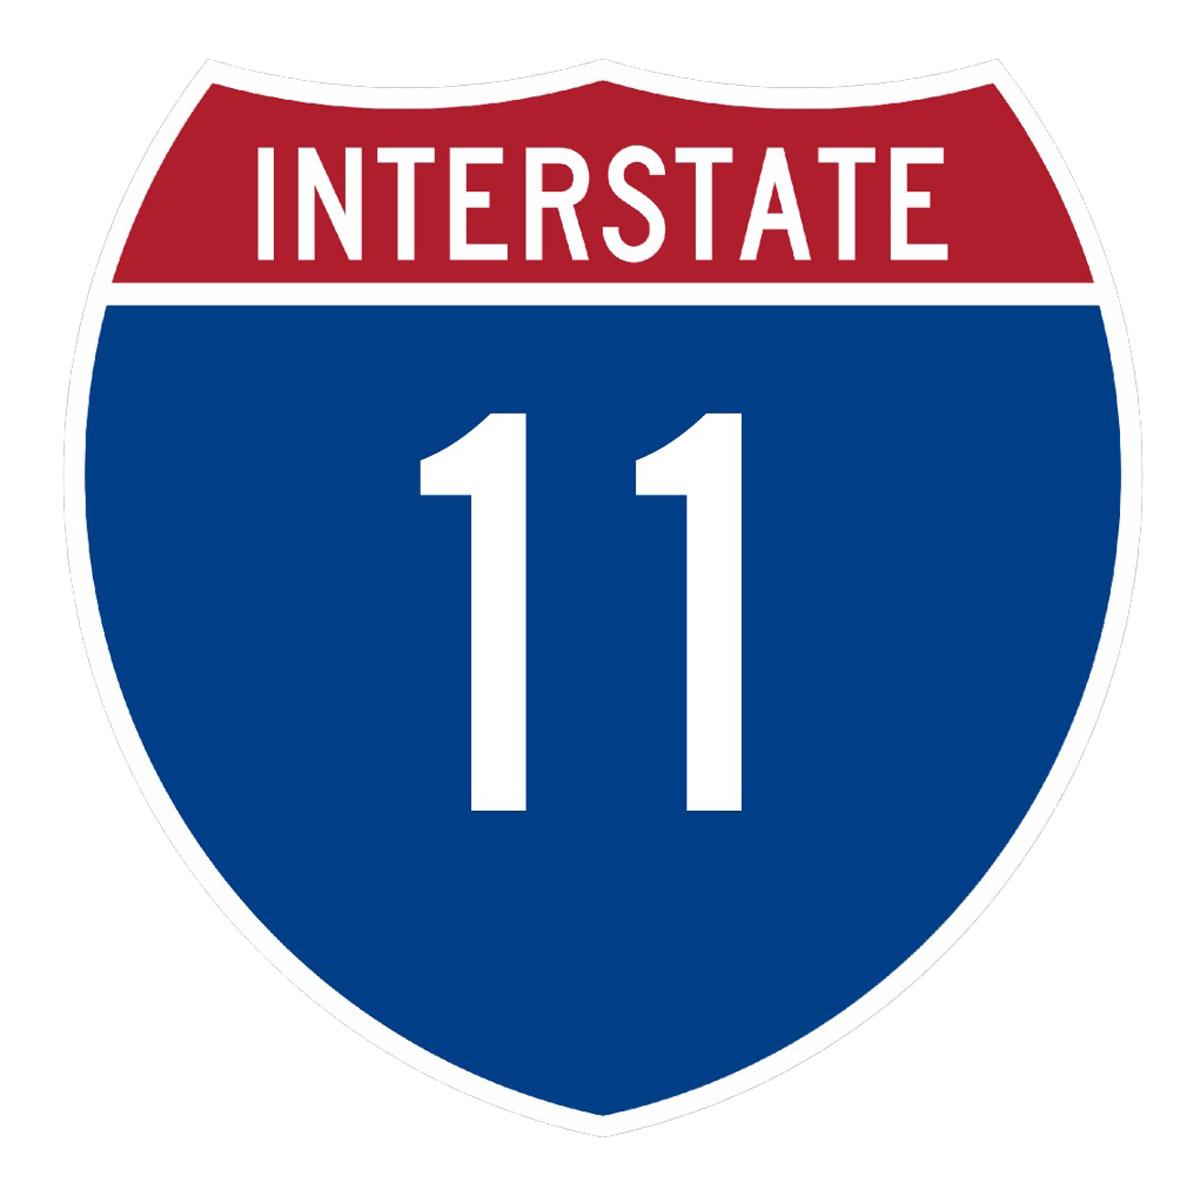 Interstate 11 Nevada Department Of Transportation - Us-highway-map-symbols